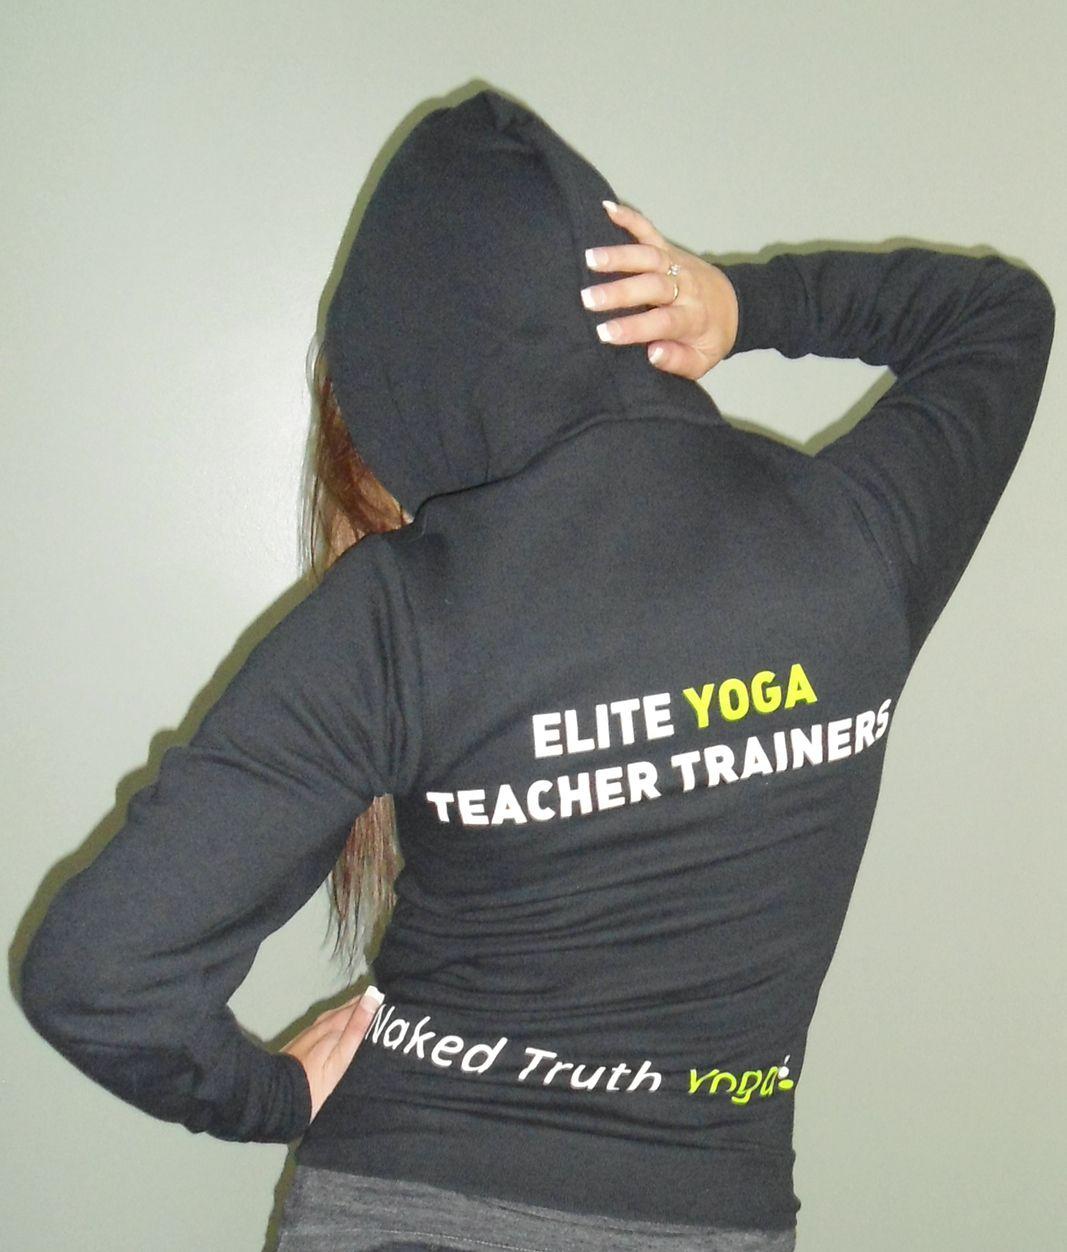 Elite Yoga Teacher Training Hoodies